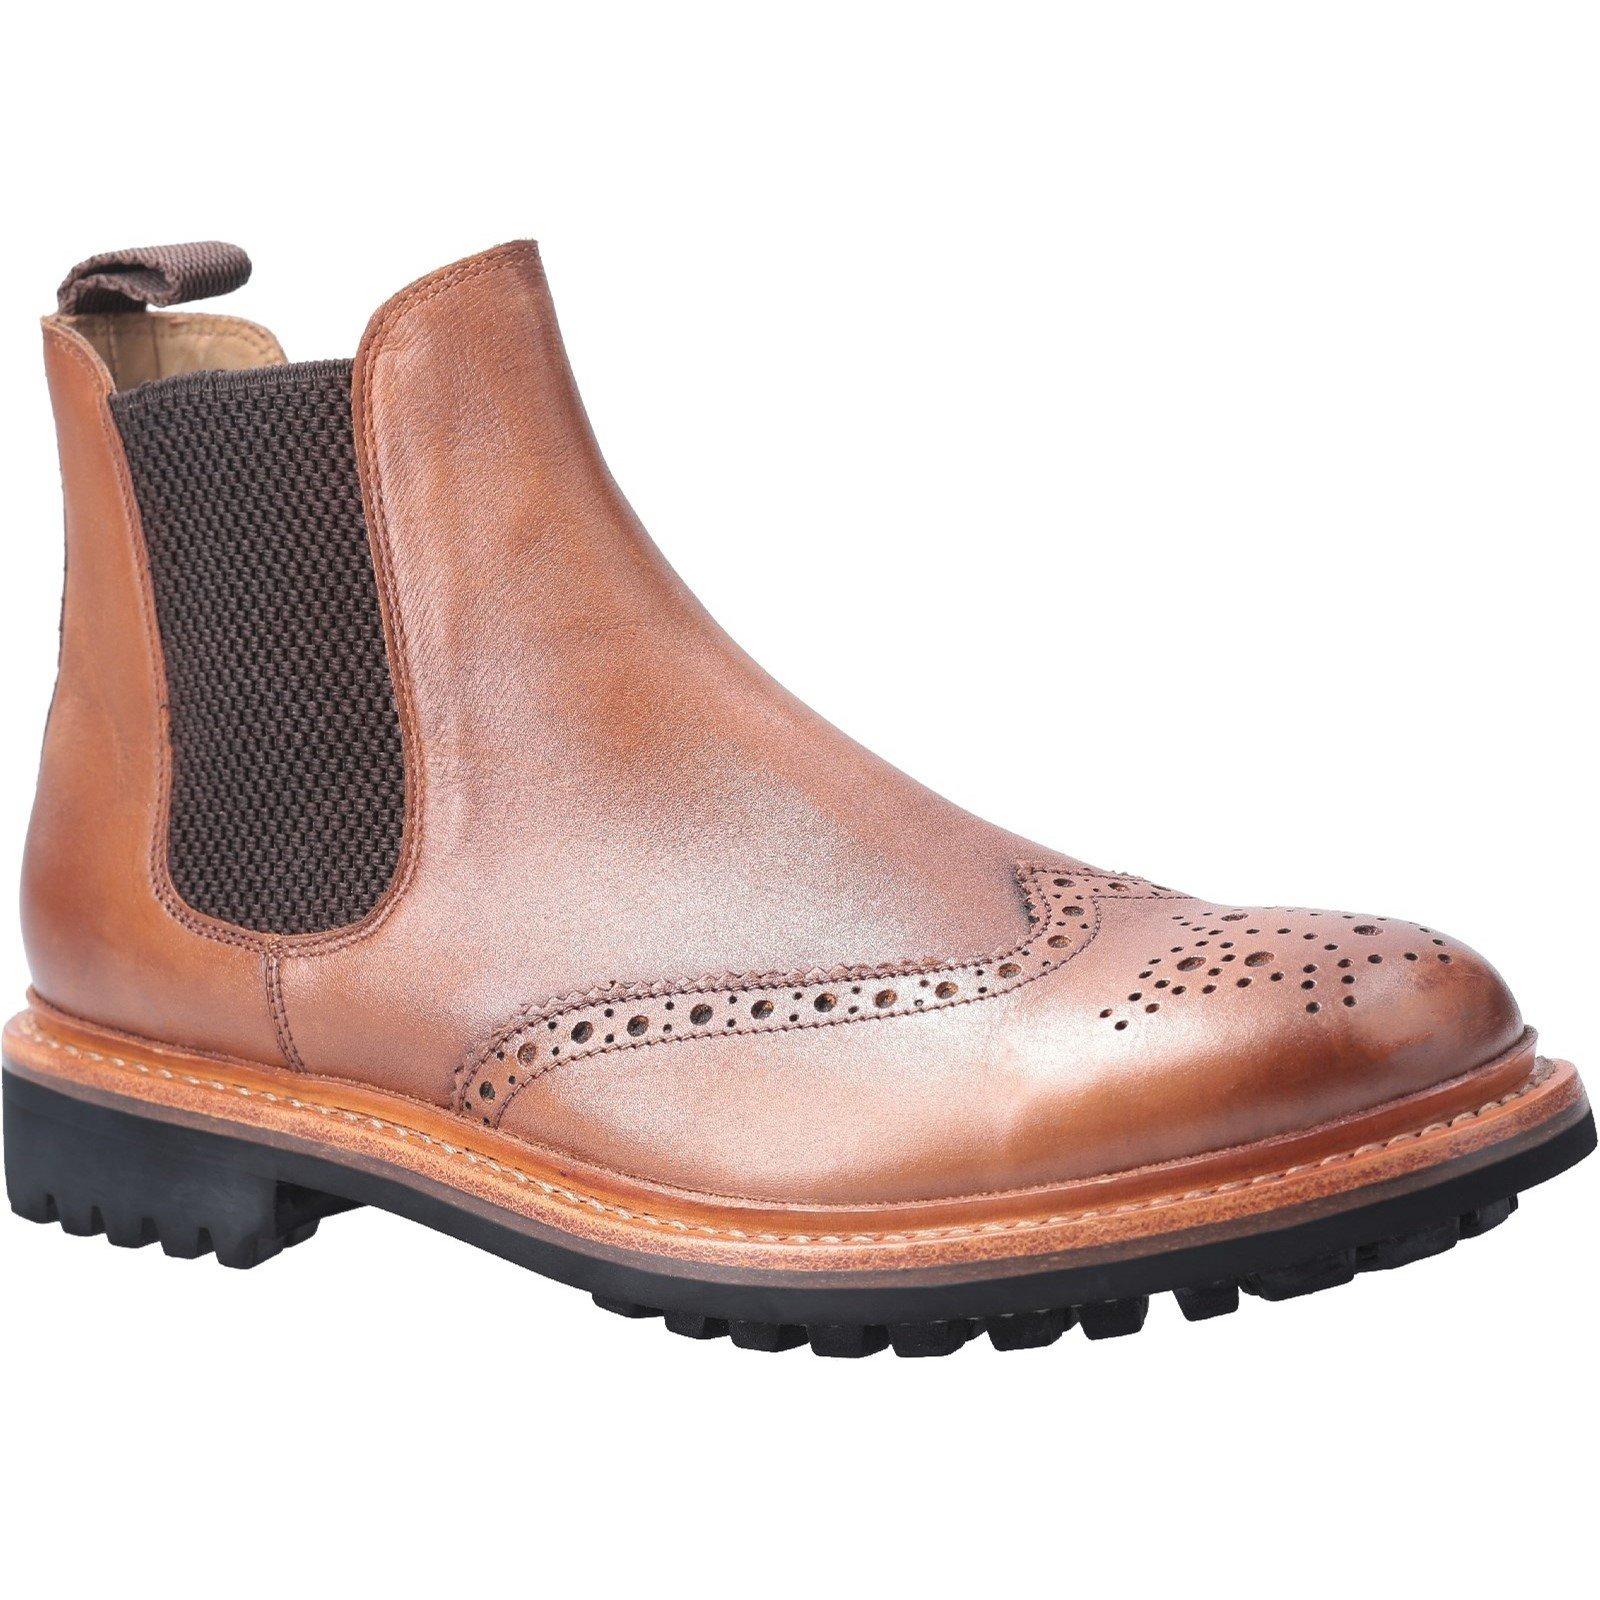 Cotswold Men's Siddington Commando Goodyear Welt Boot Brown 29259 - Brown 12